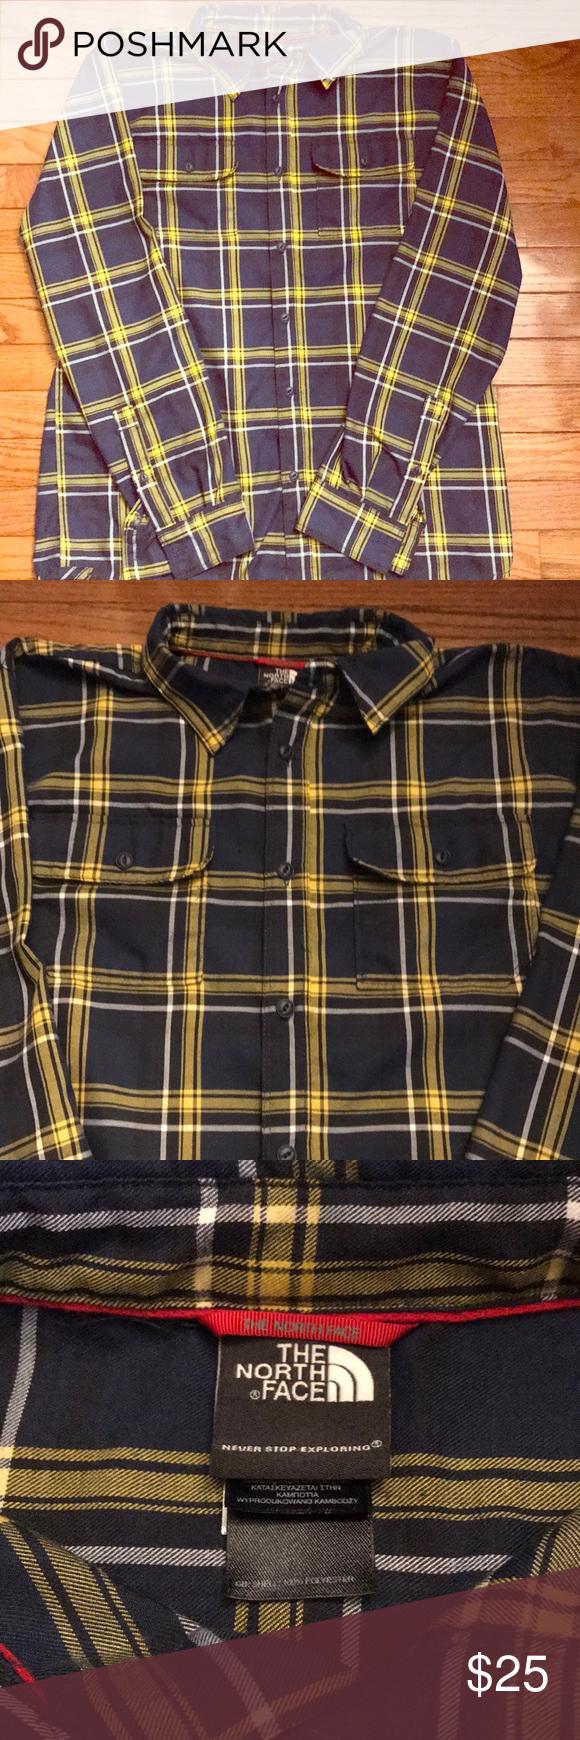 7a228e3f1a2 North Face Men s Long Sleeve Shirt